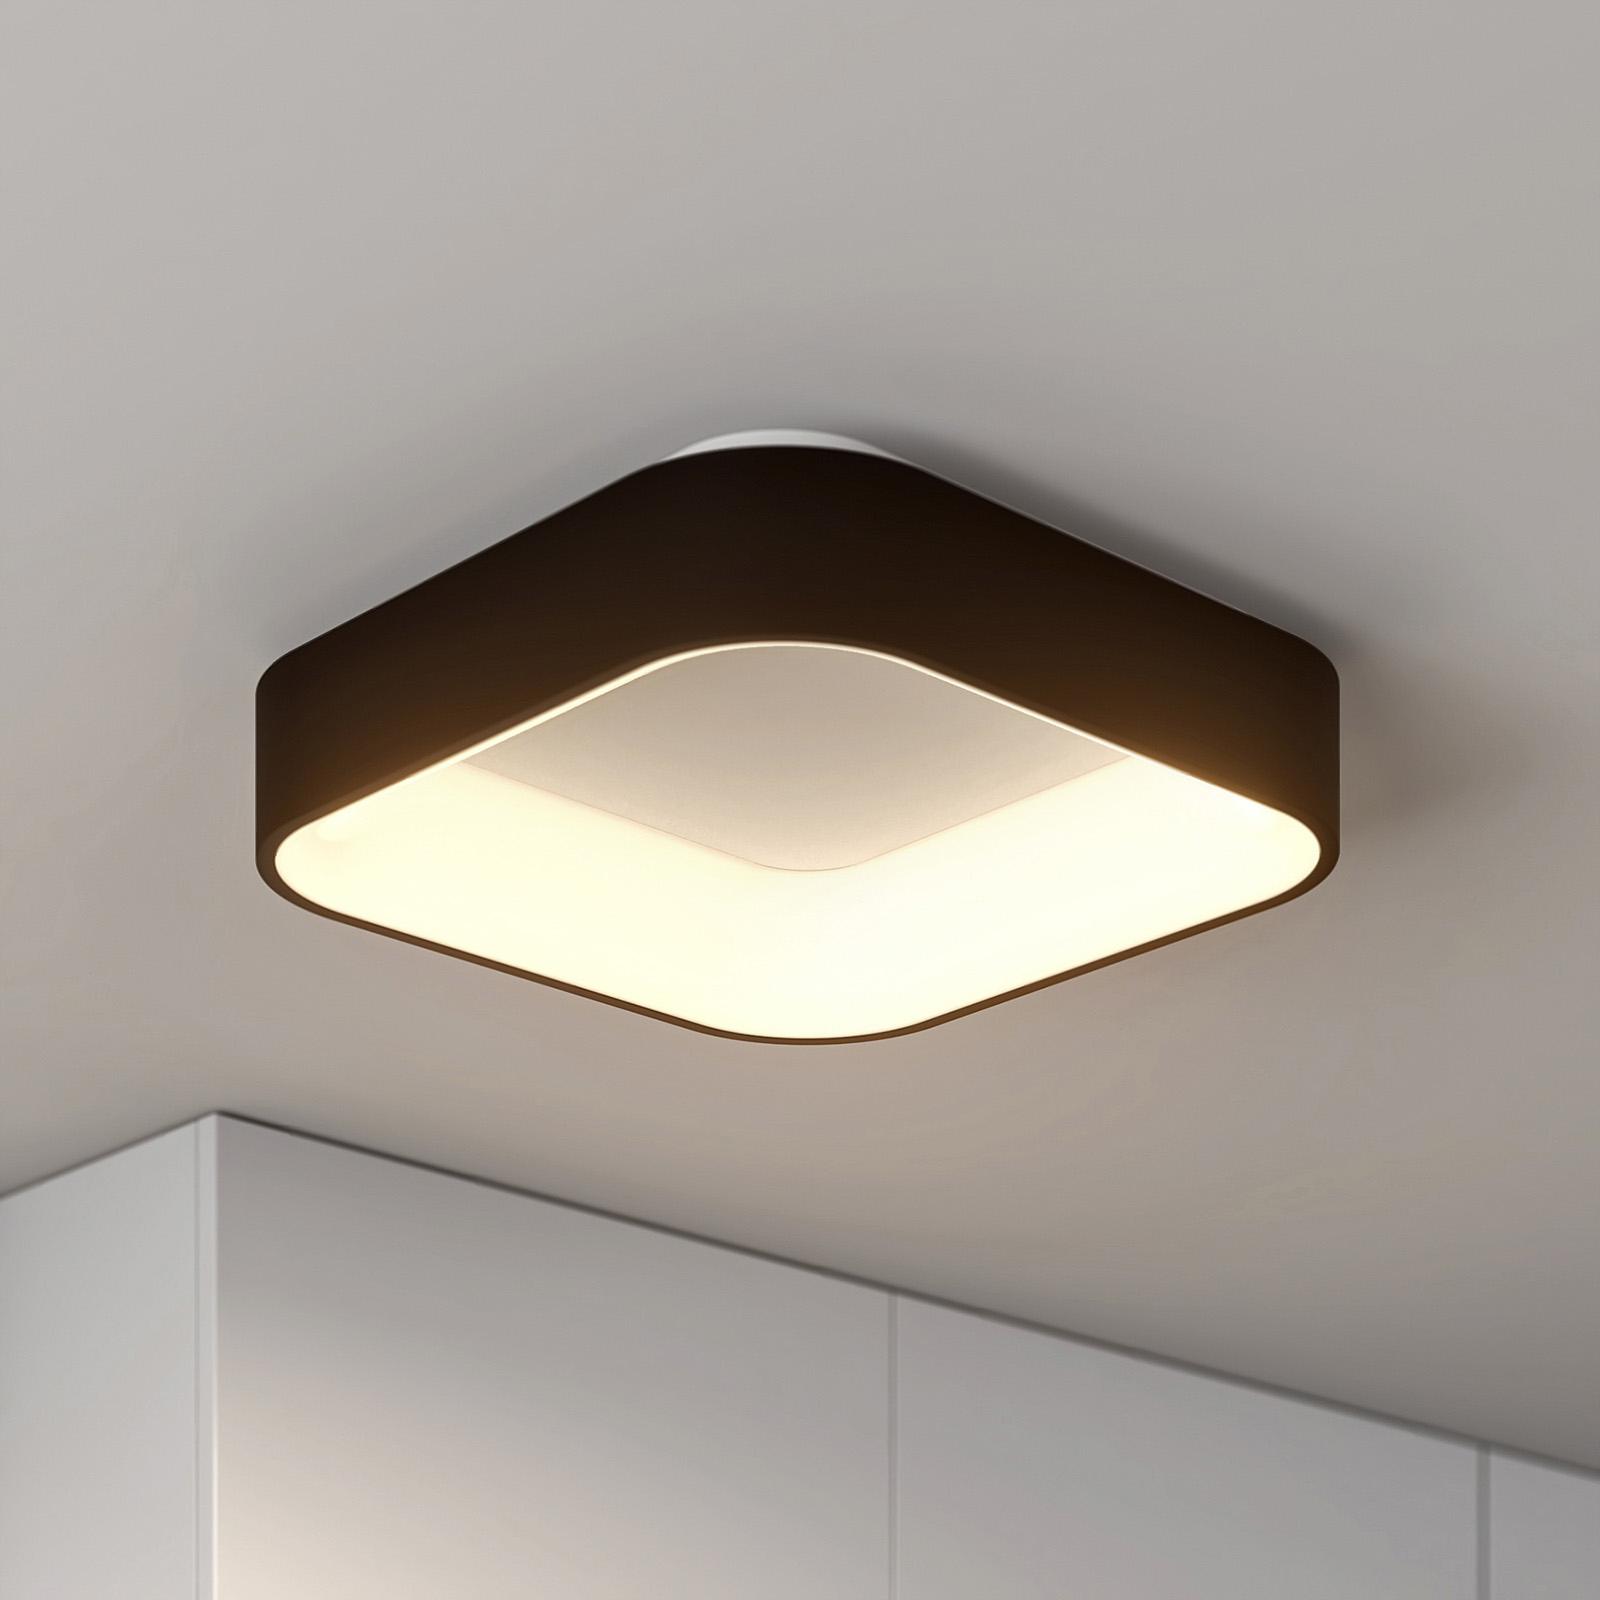 Arcchio Aleksi LED-loftlampe, 45 cm, kantet